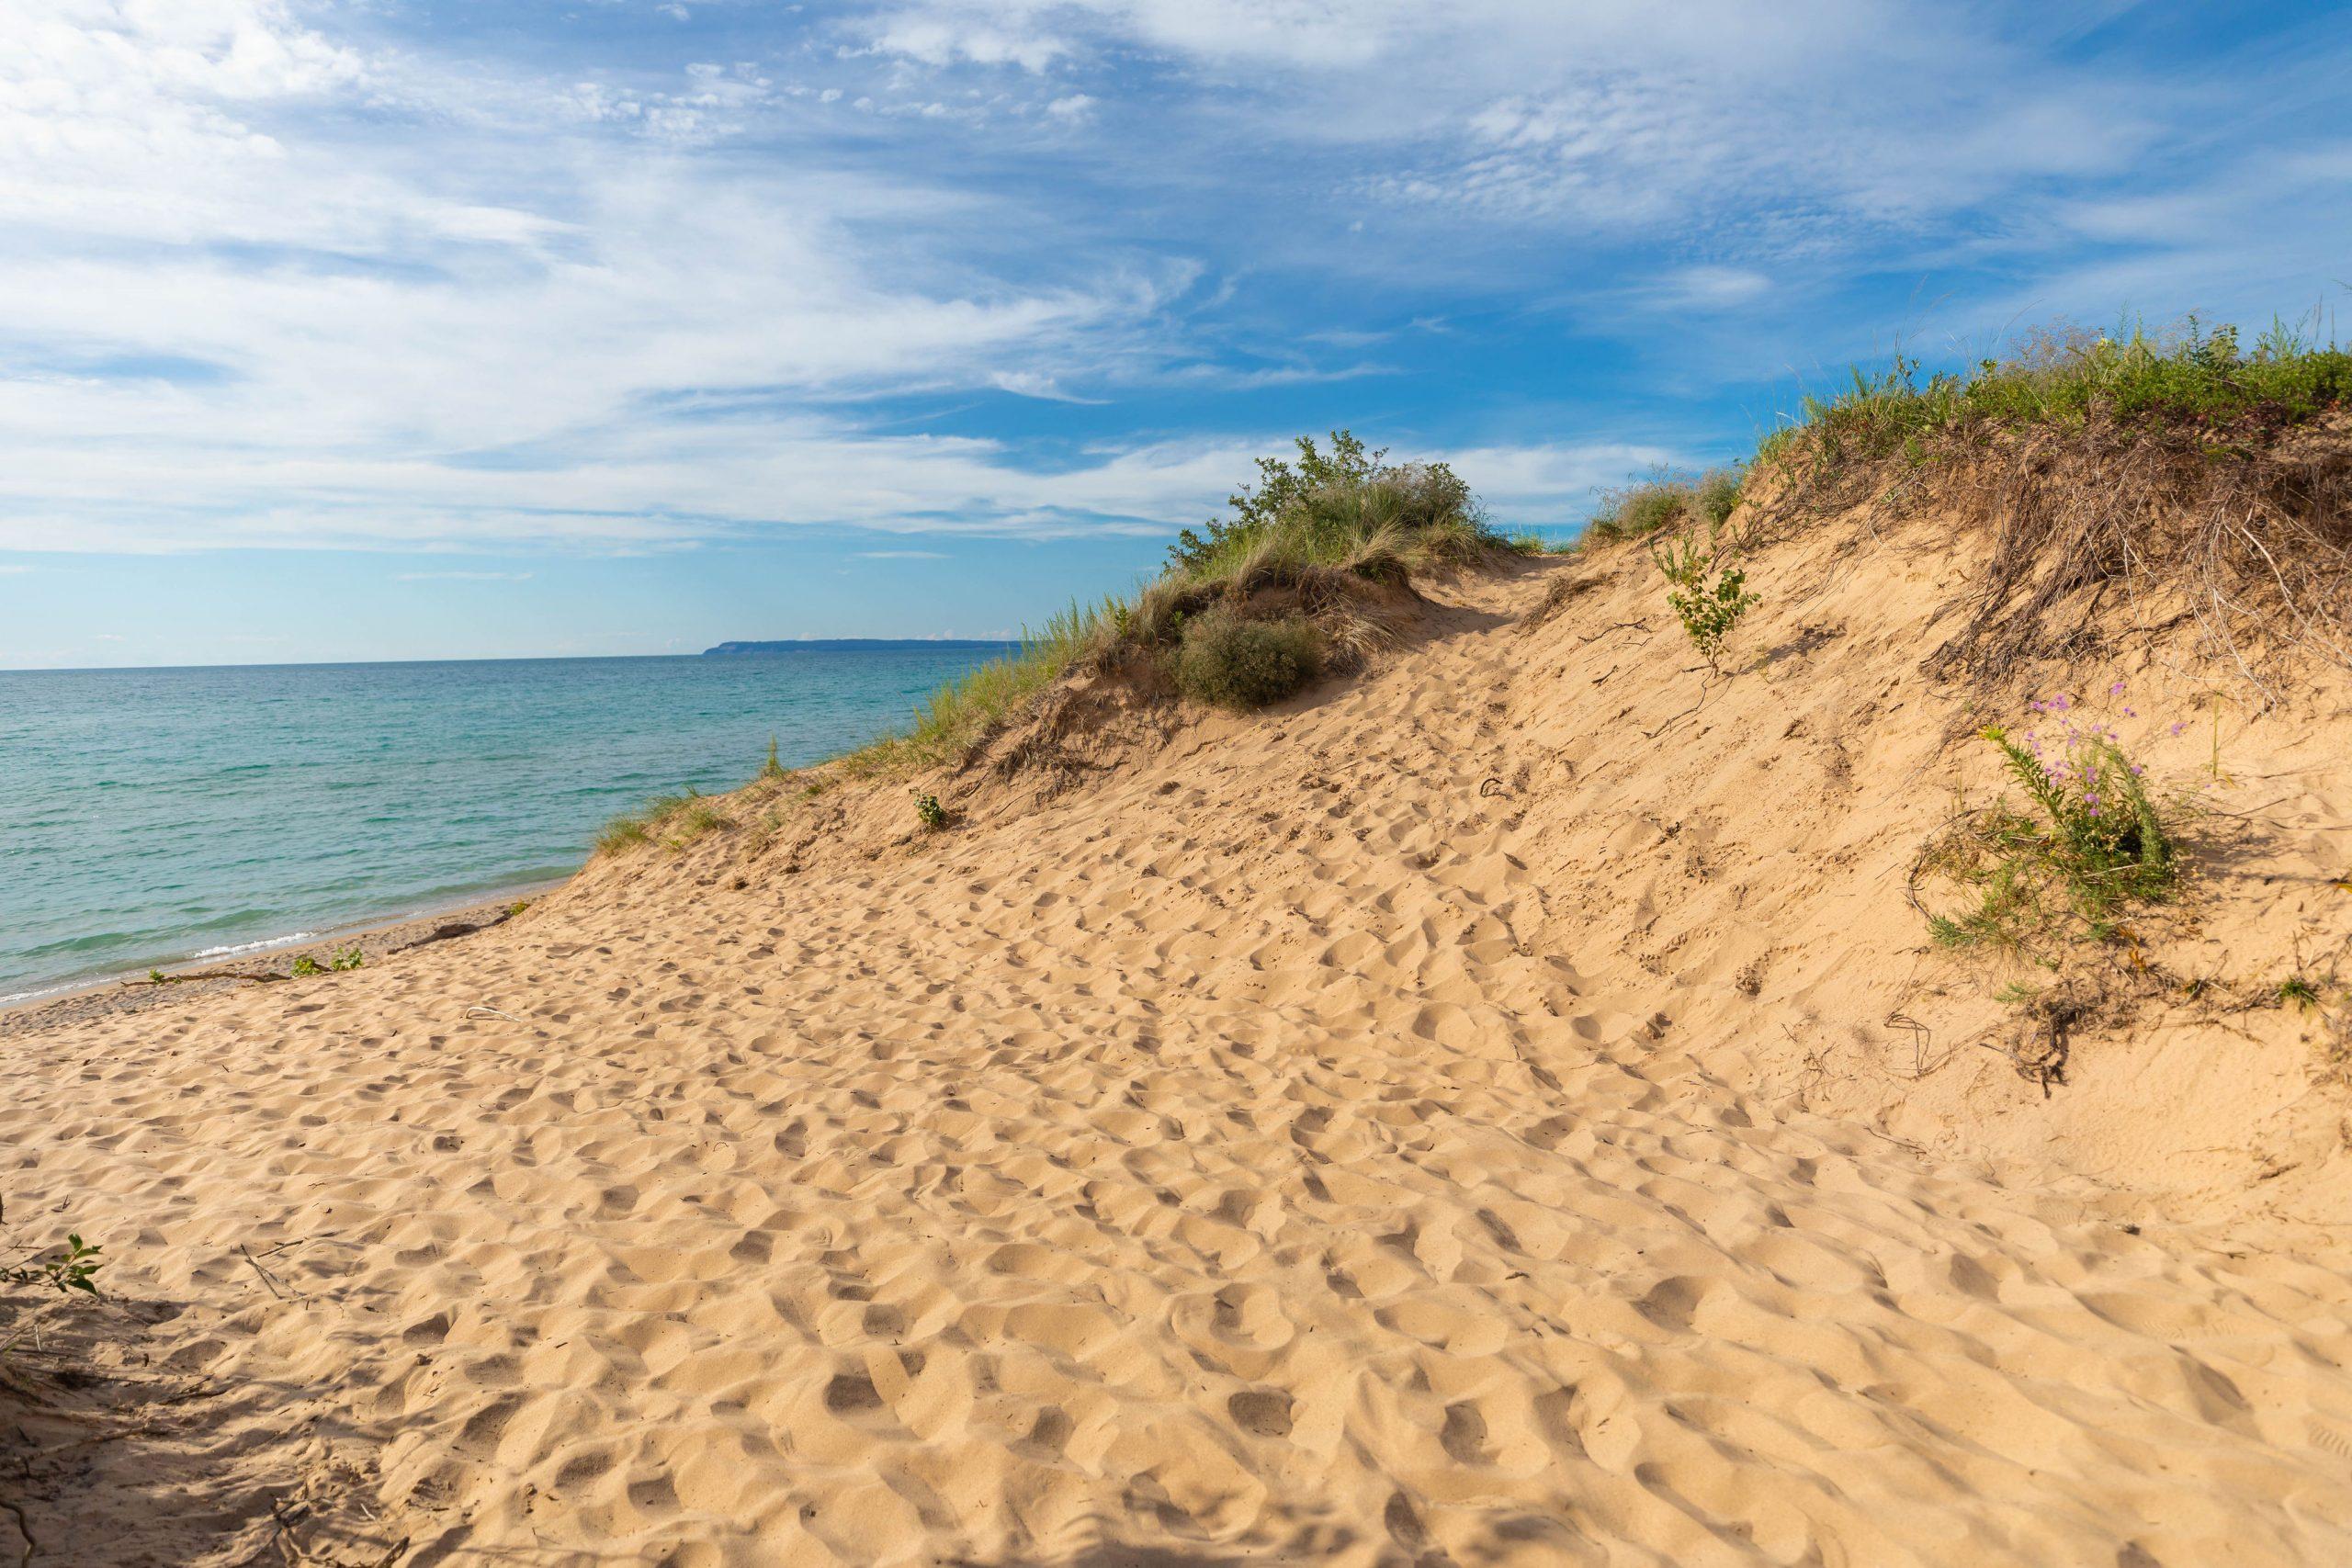 Sleeping Bear Dunes National Lakeshore Travel Guide by Annie Fairfax